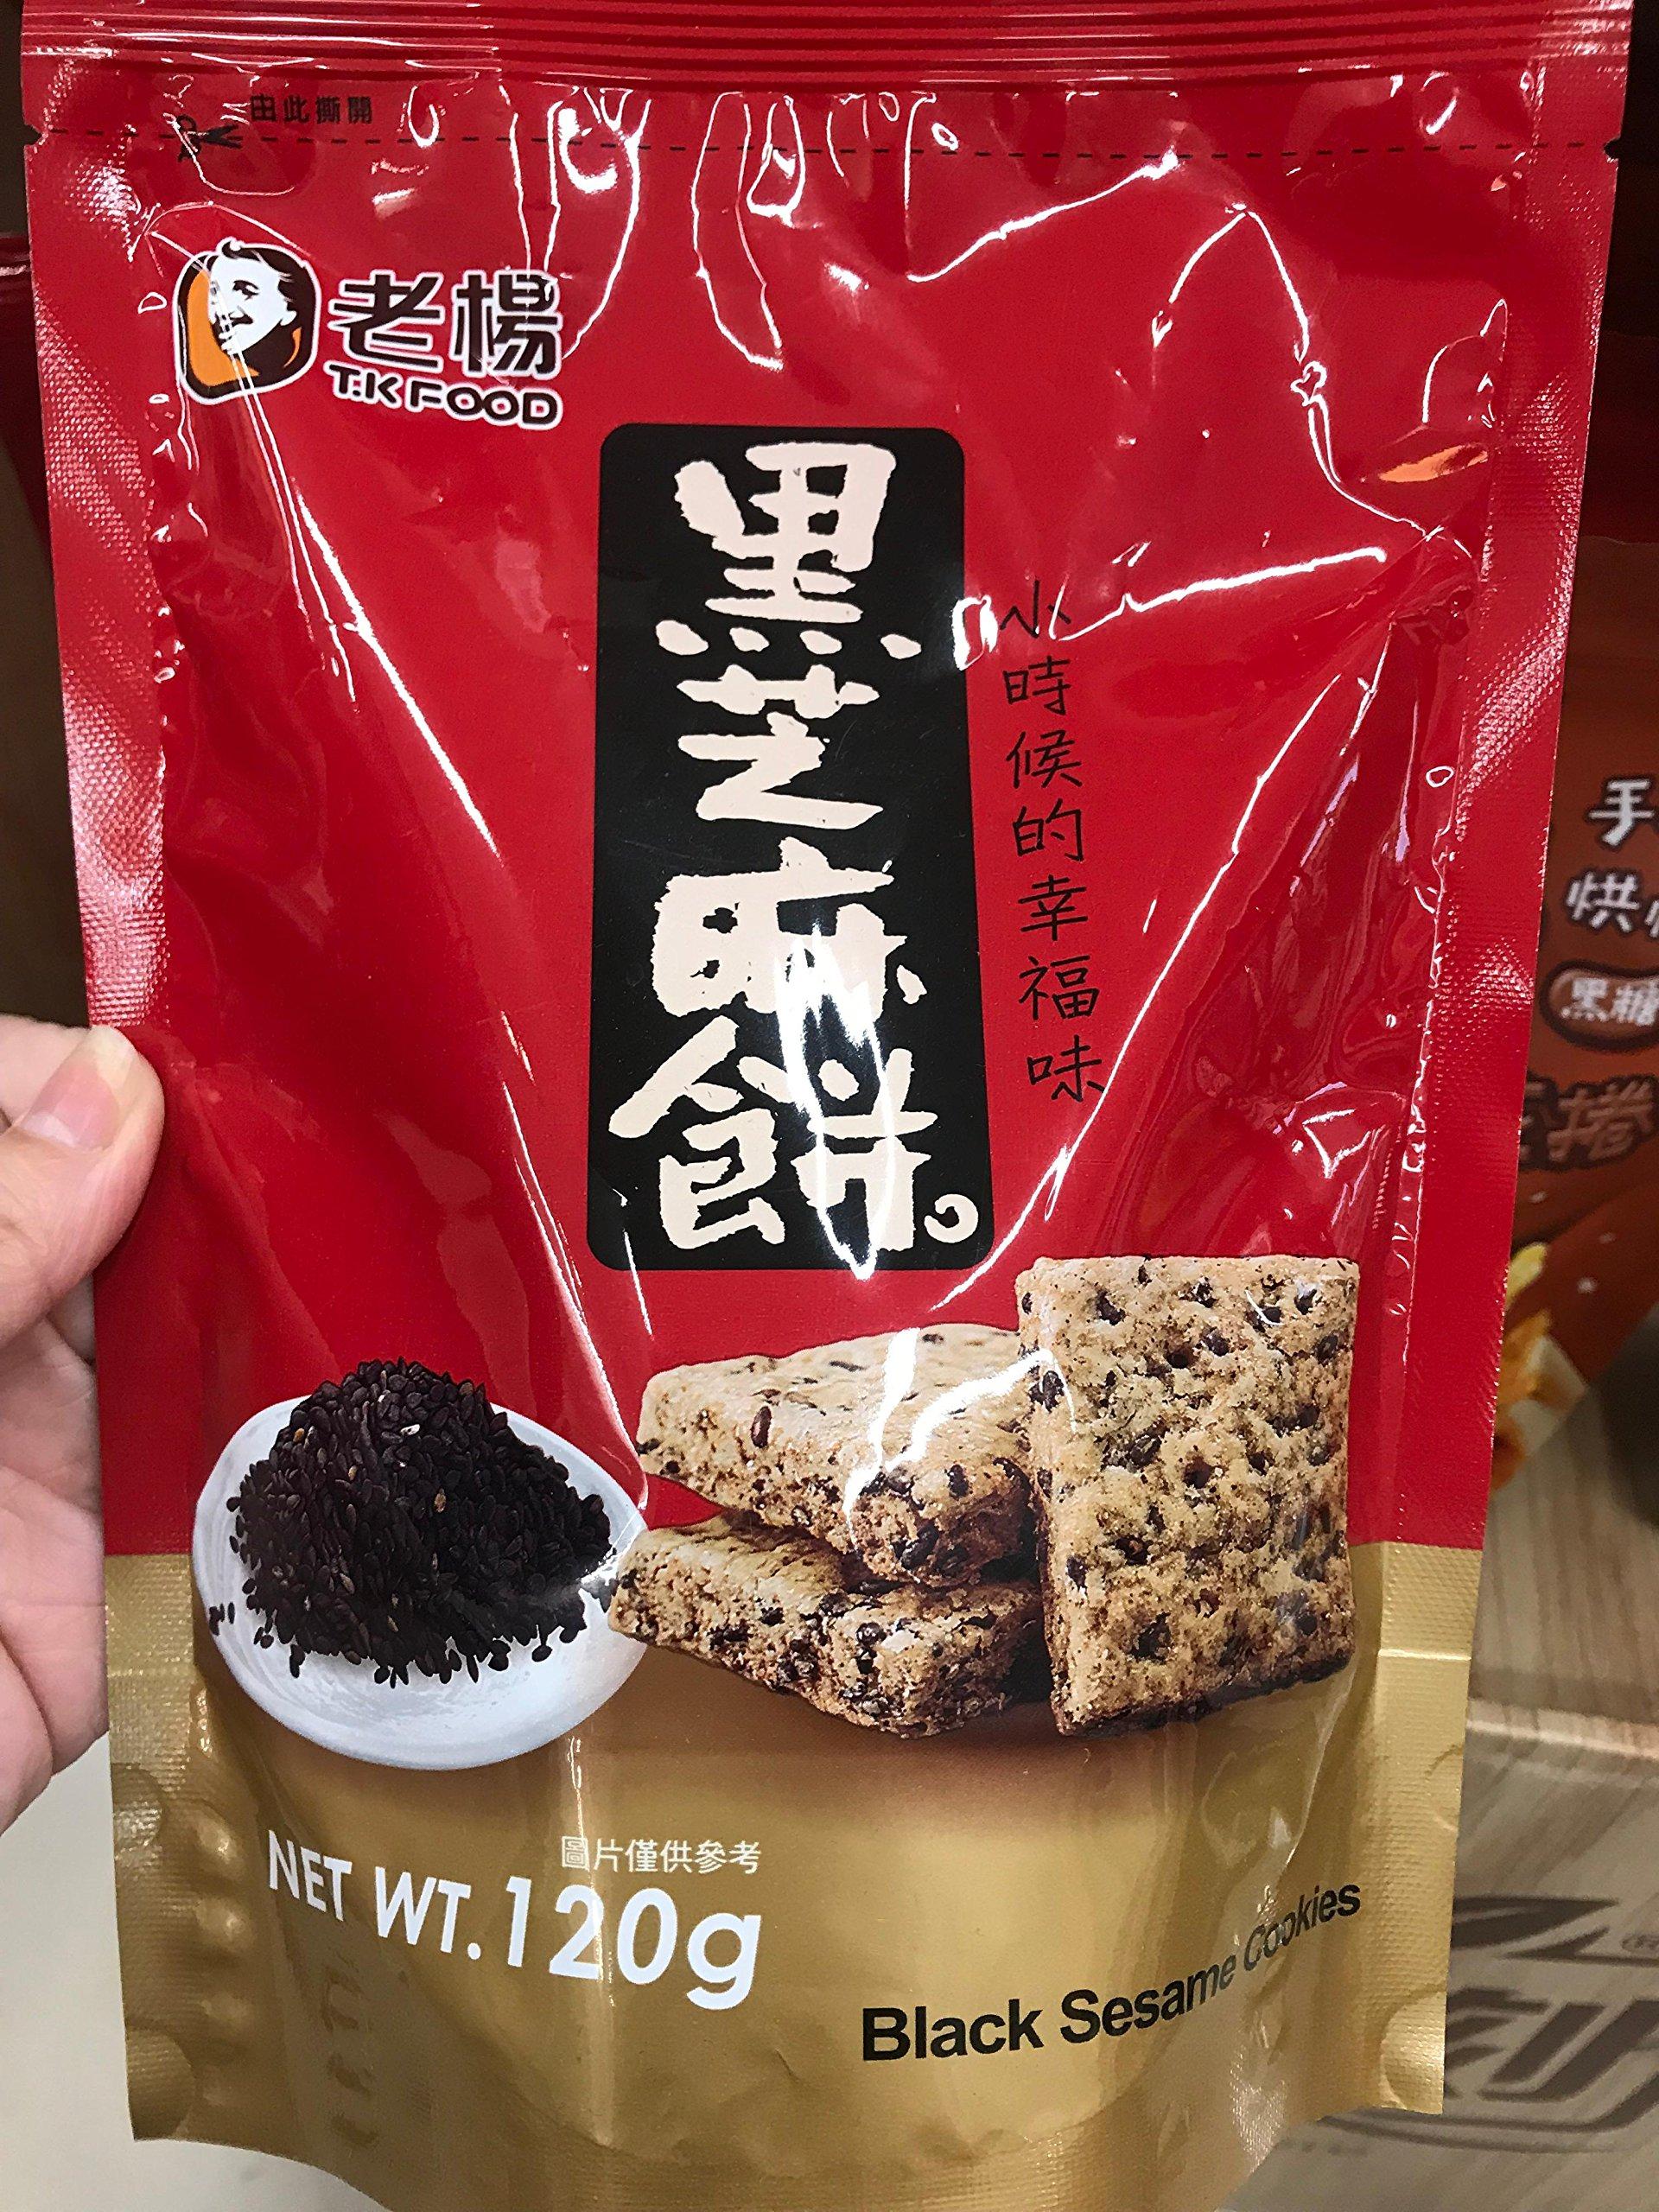 Black Sesame Crisp (Taiwan local cookies) 台灣老楊黑芝麻餅 方塊酥